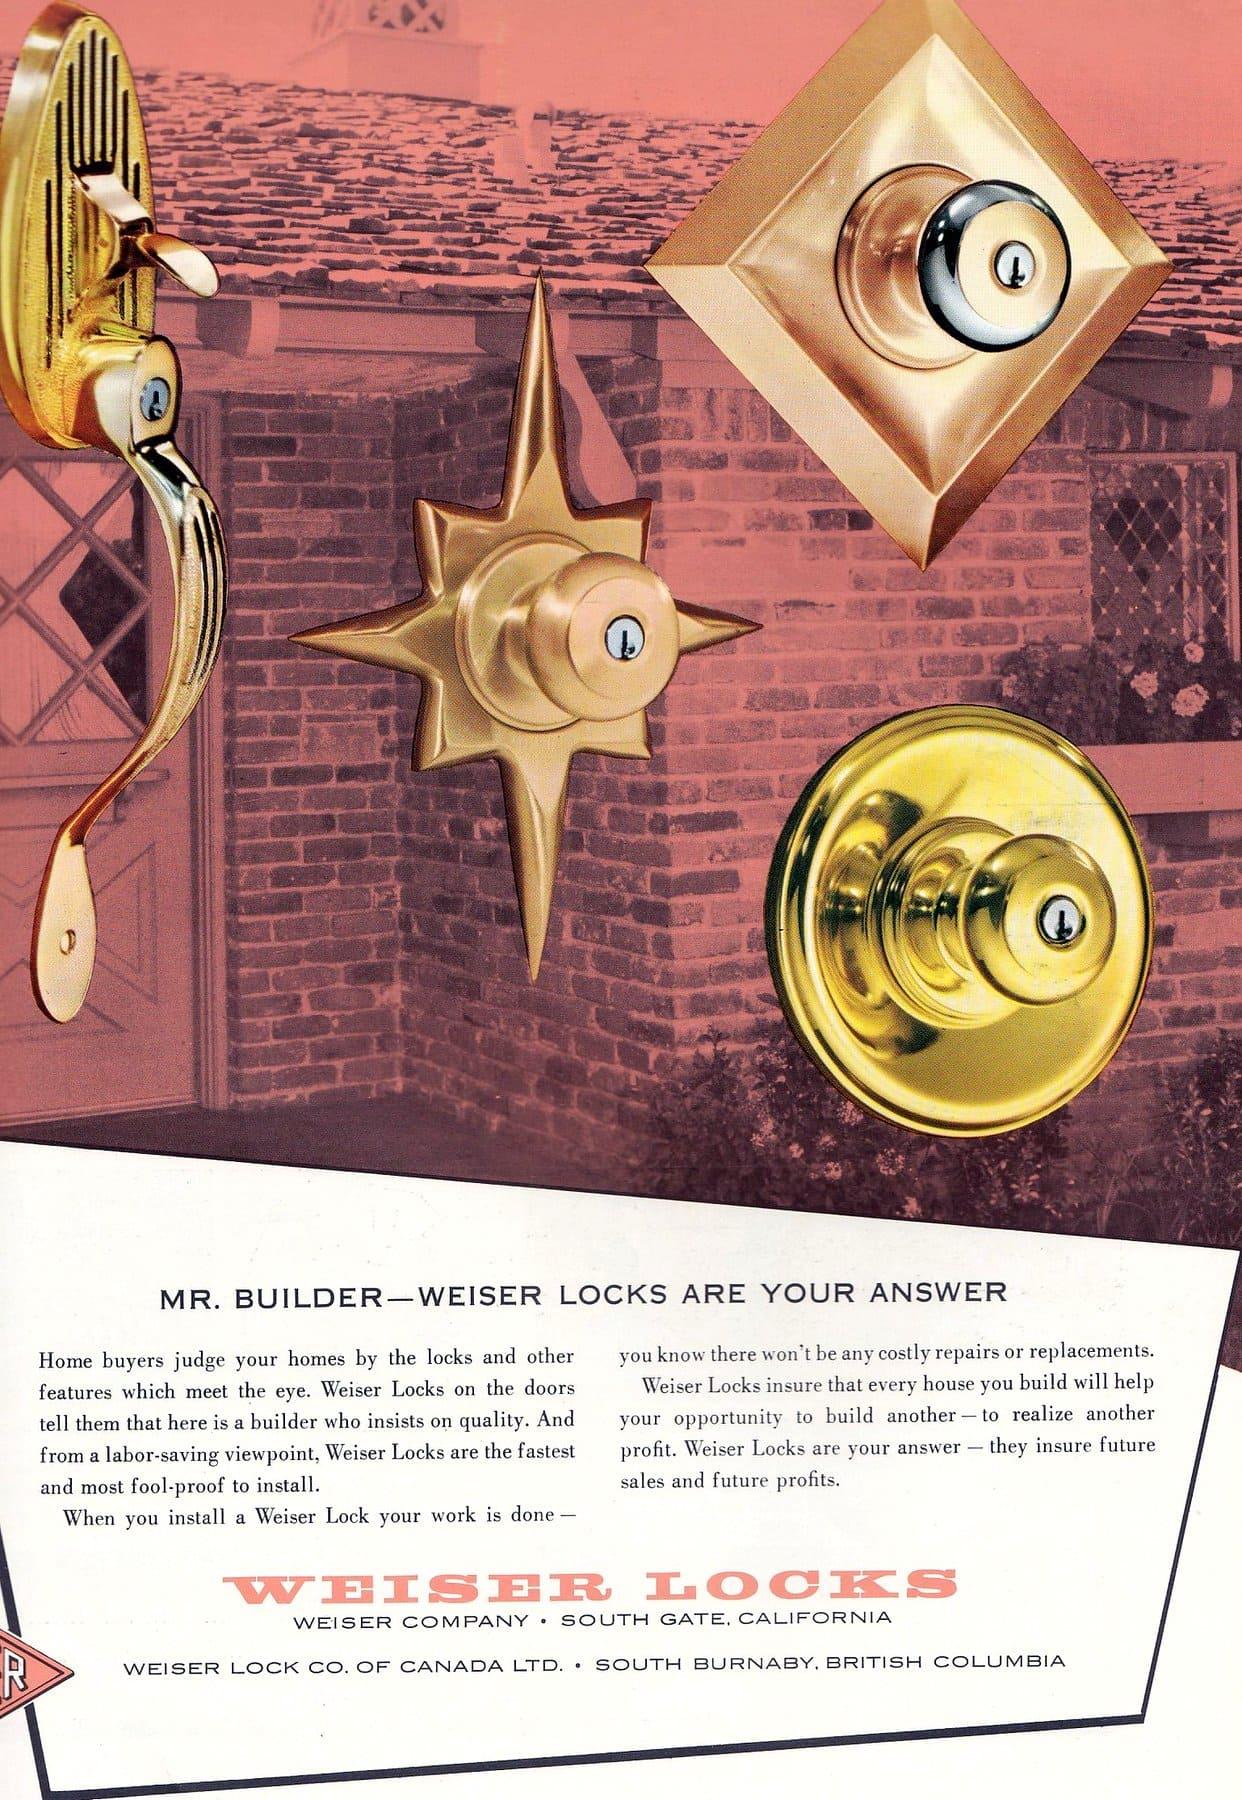 Weiser mod door locks for home from 1958